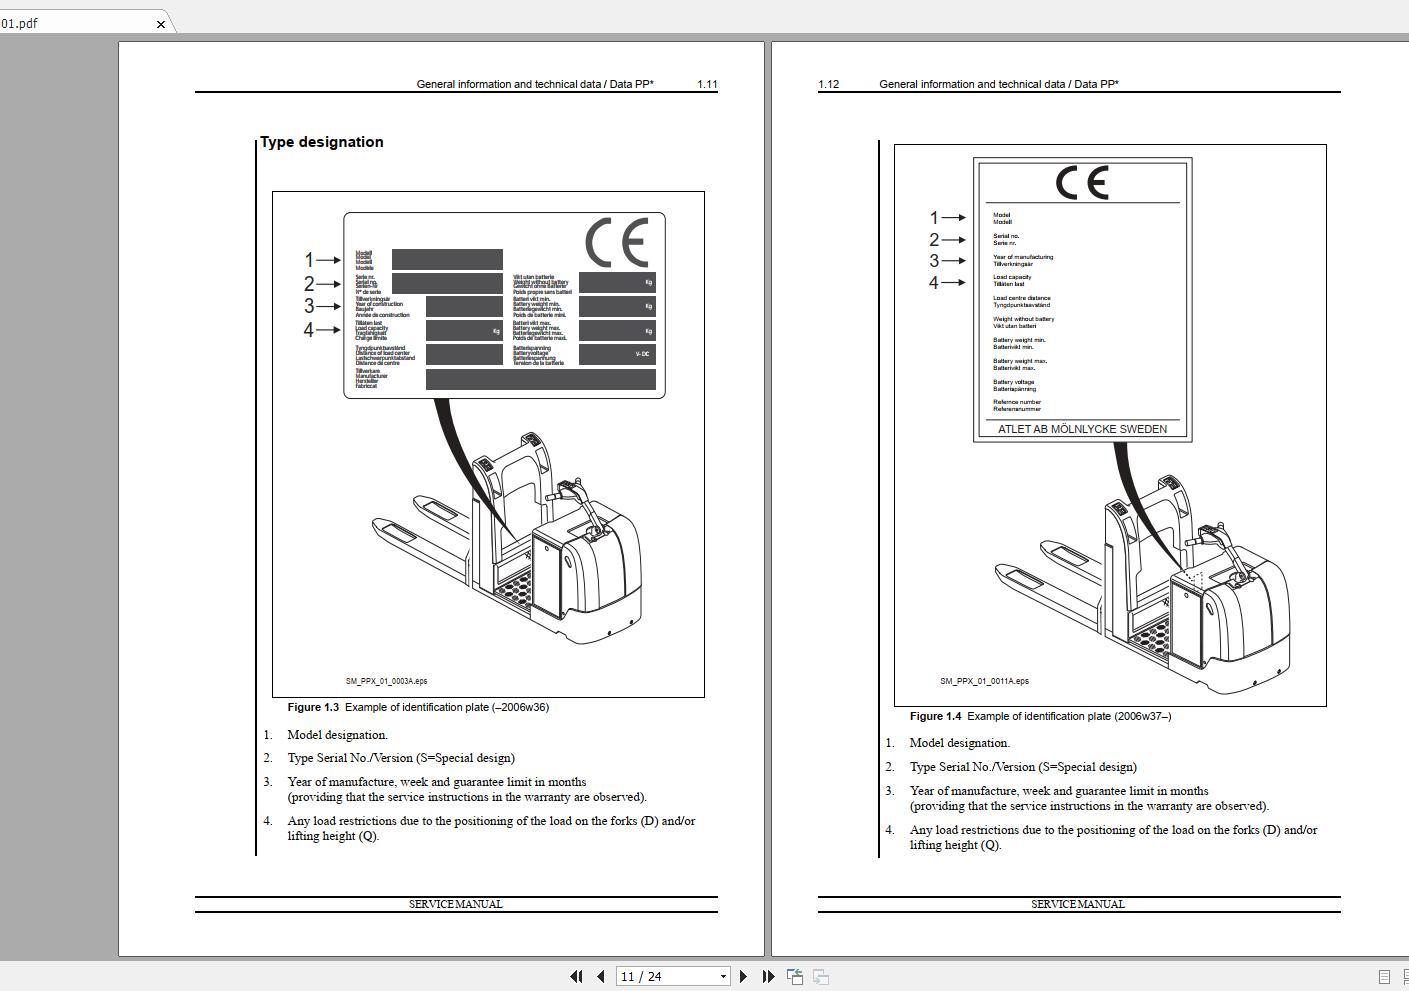 Nissan_Forklift_Warehouse_PP_Series_119036-119037_Service_ManualENDE_1